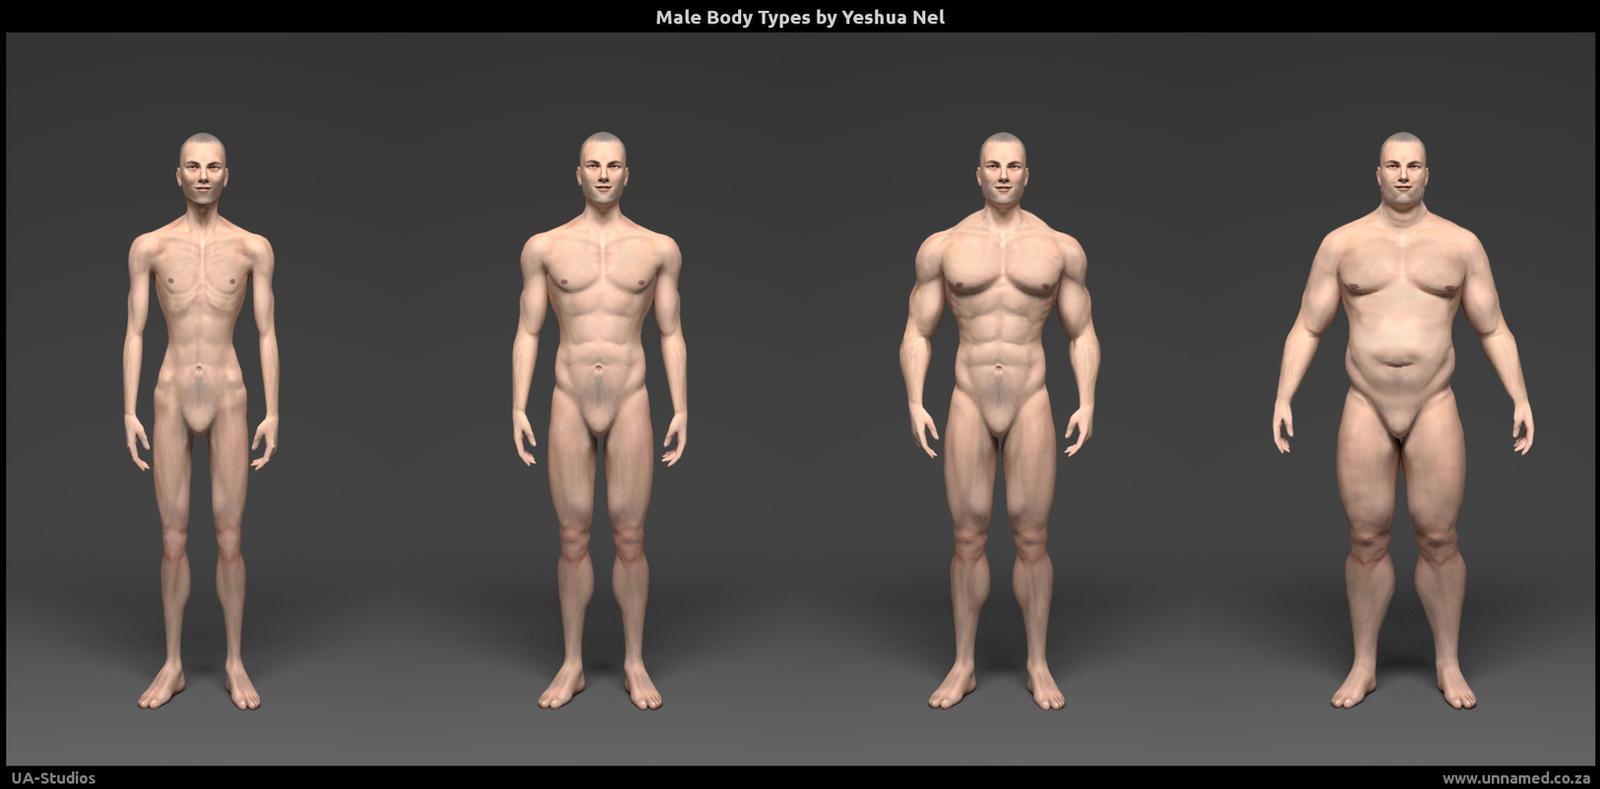 Male body types - financeandbusiness